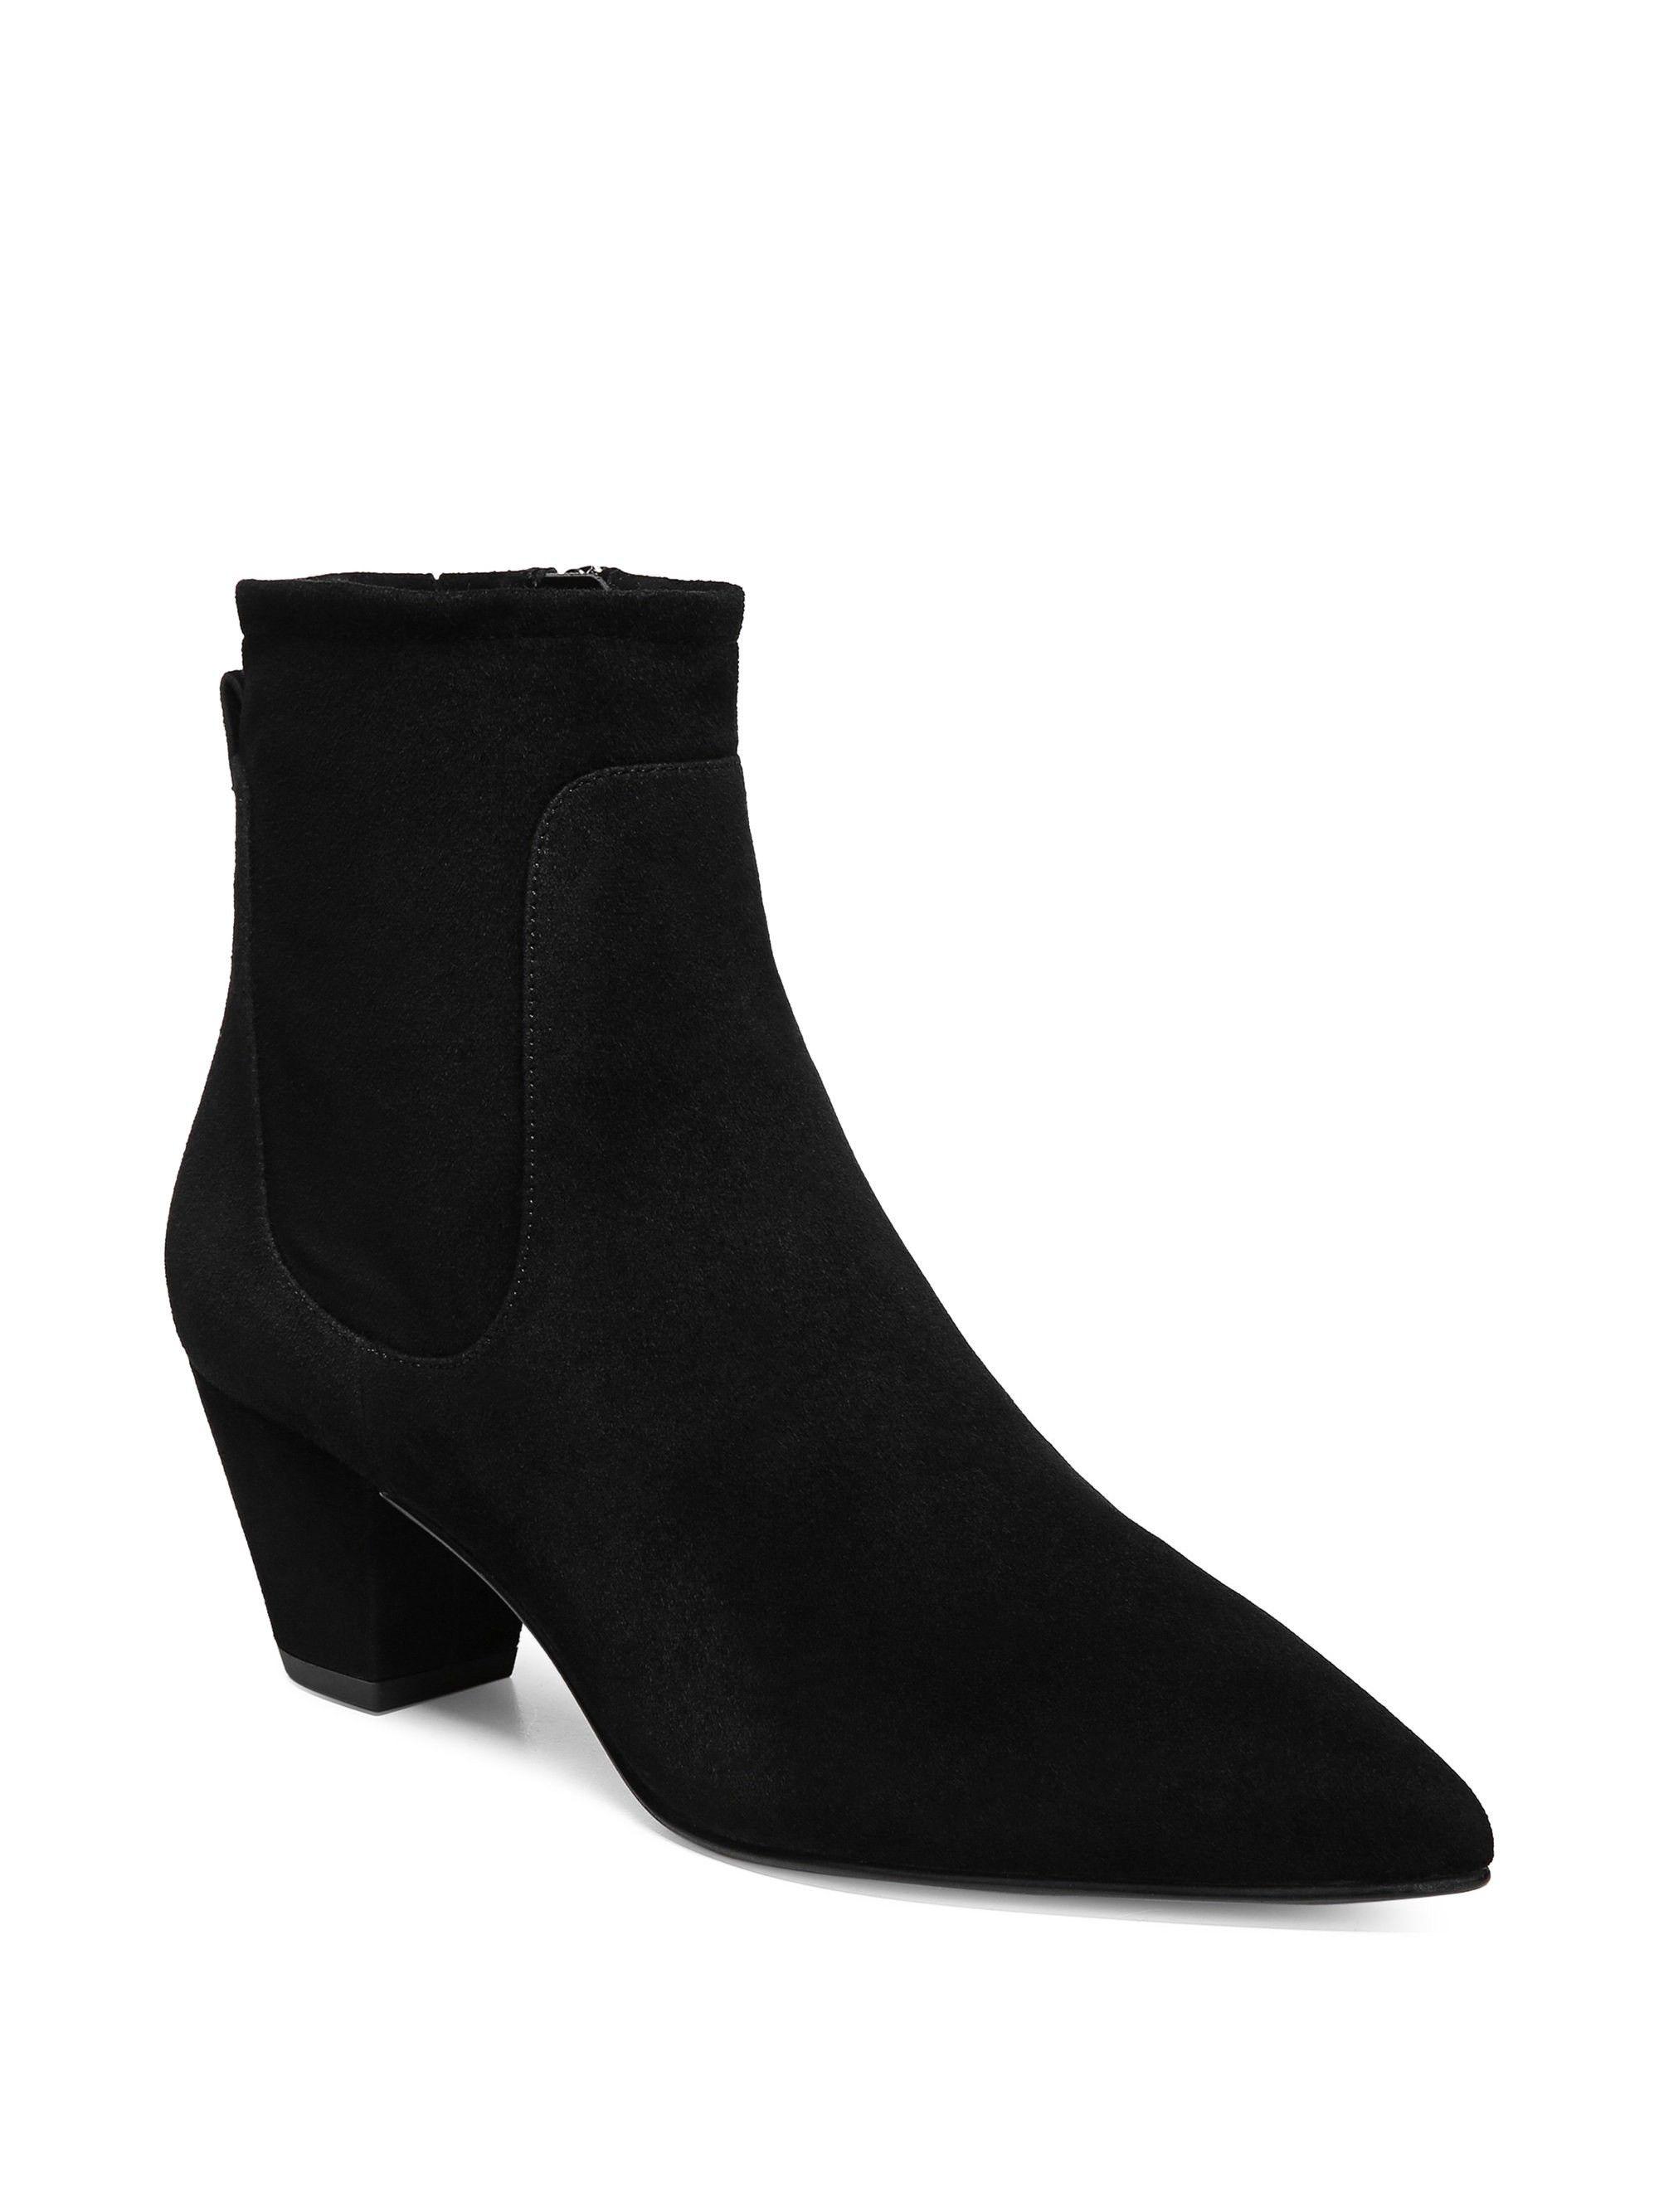 d411d1441ab67 Sam Edelman Karlee Suede Boots - Black 10.5